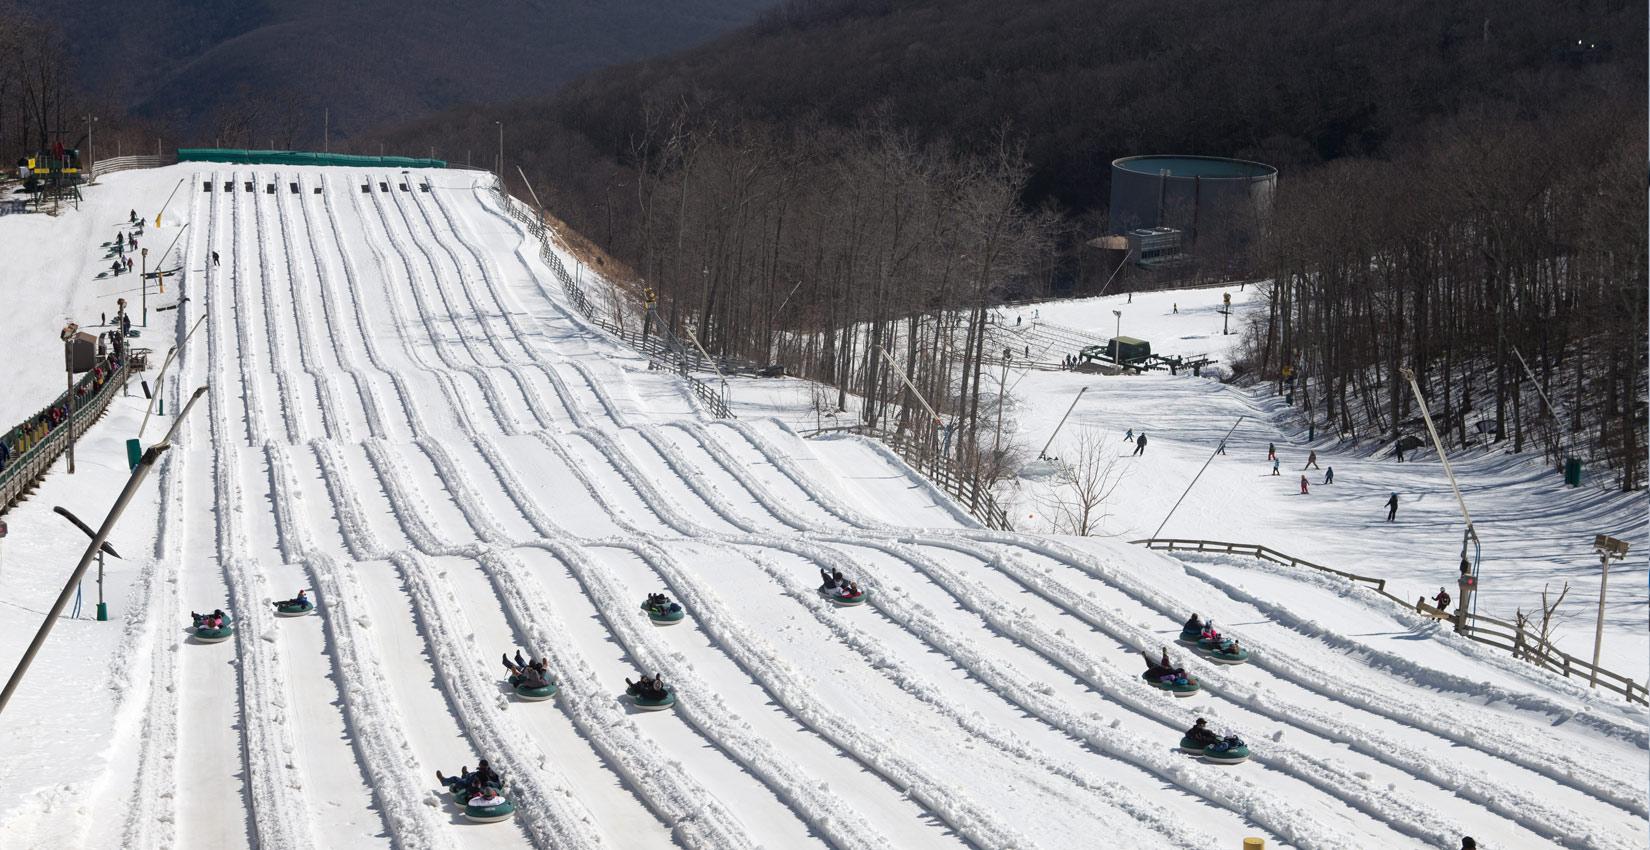 wintergreen has the biggest snow tubing park in virginia